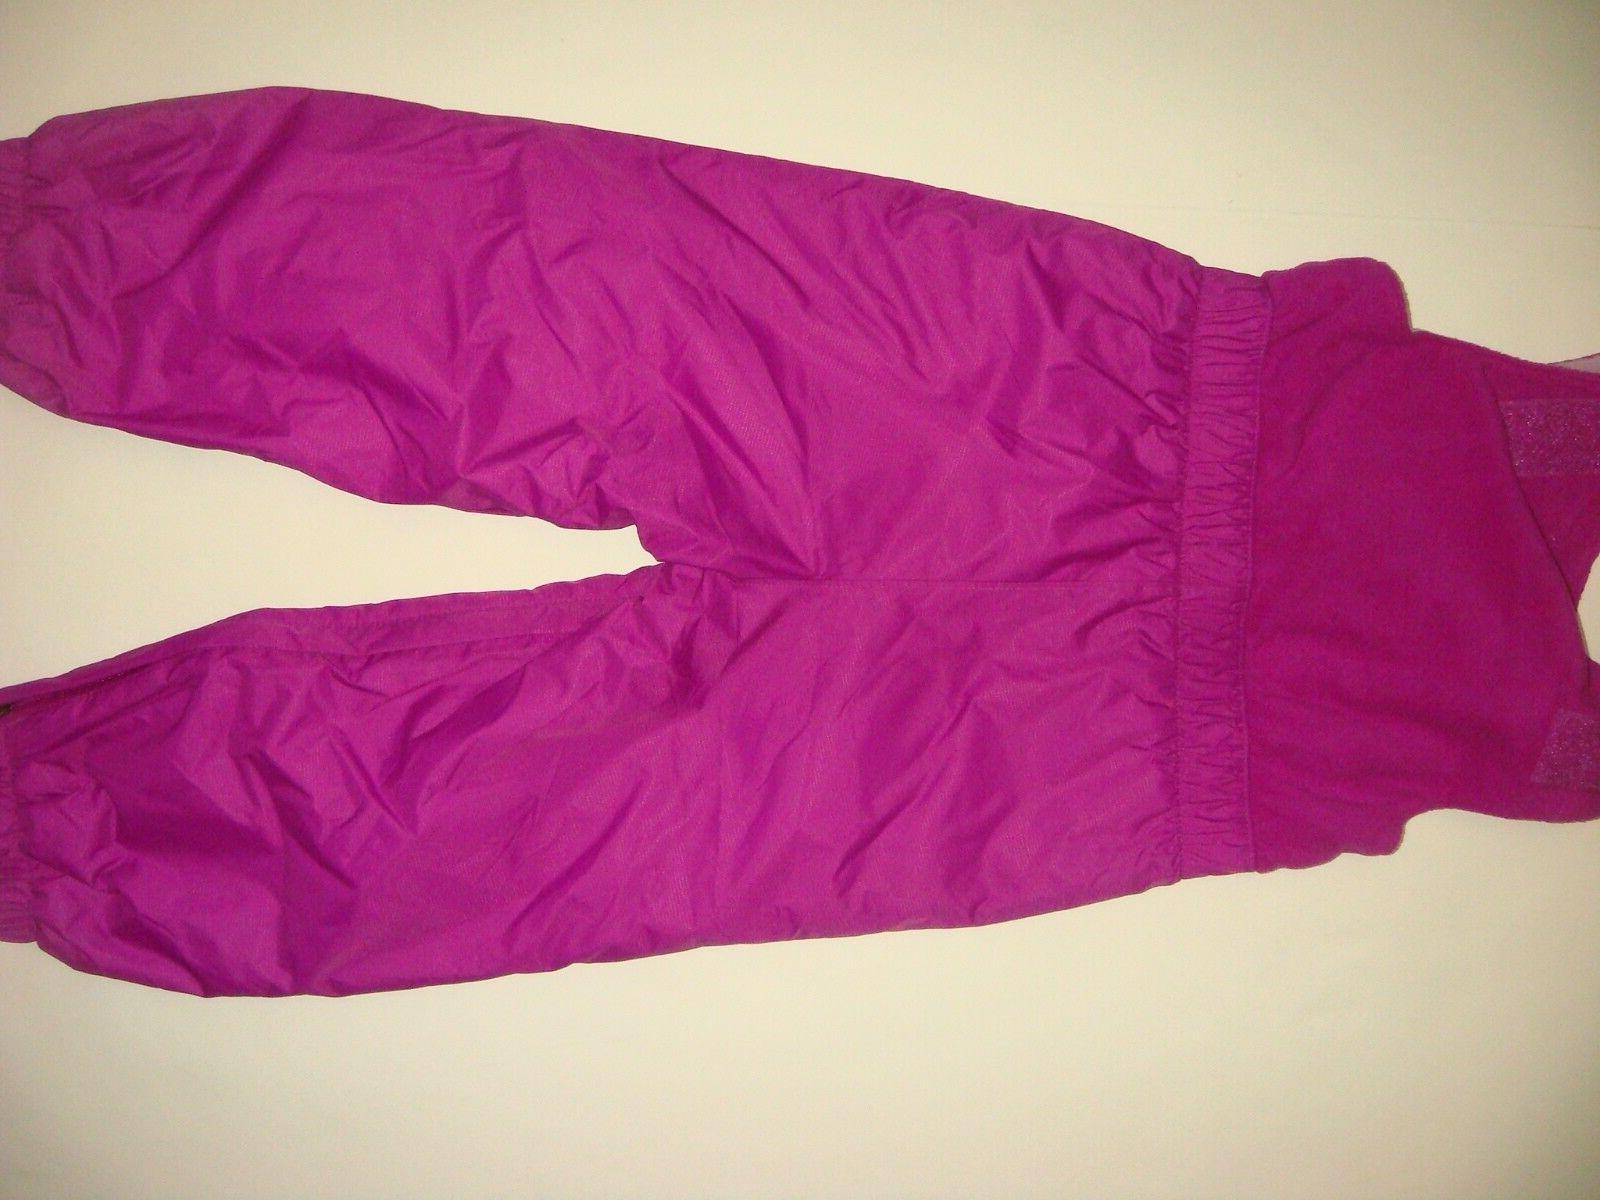 COLUMBIA SNOW jacket reversible+bib PURPLE lilac $130+